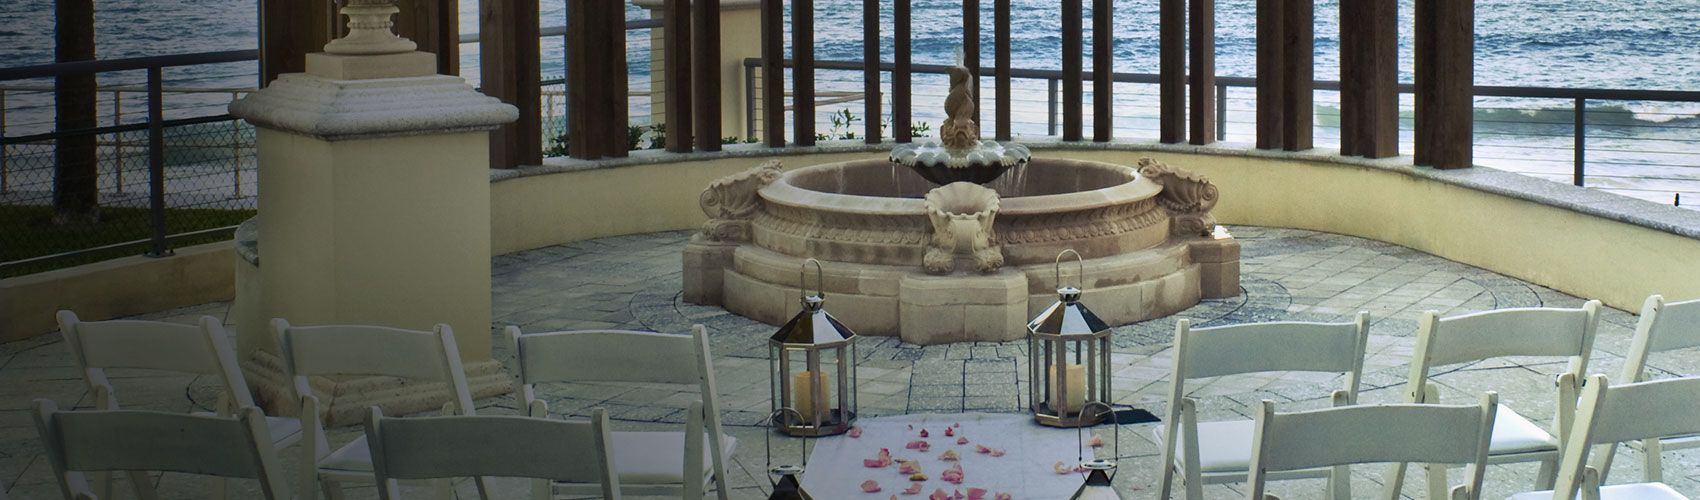 Weddings In Vero Beach